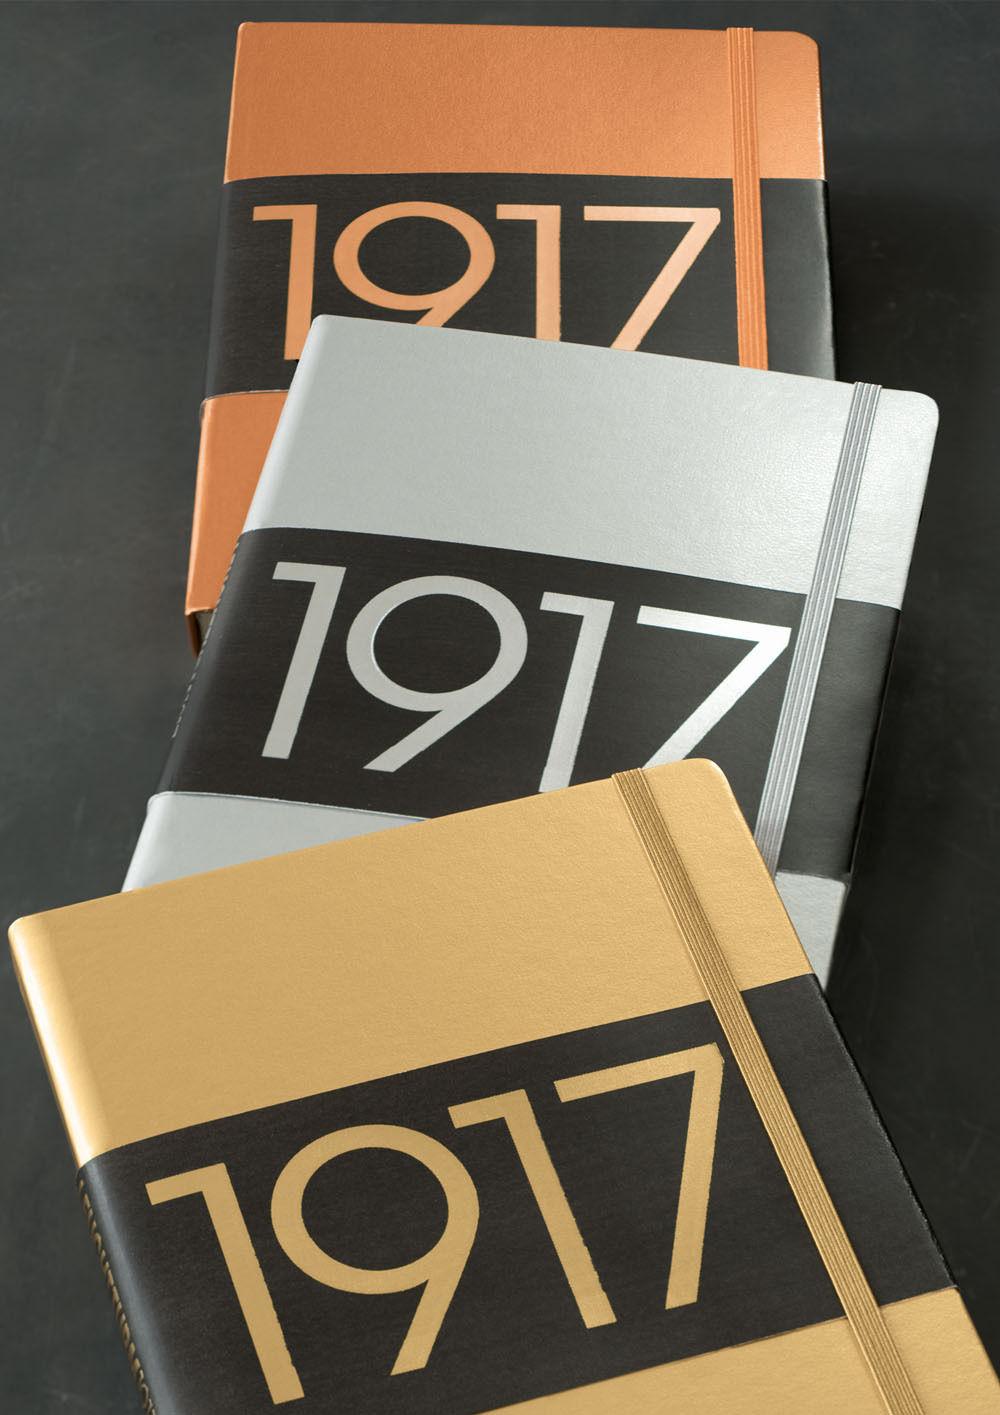 Leuchtturm1917-100Years-Metallic-Edition-A6-Hardback-Notebook-Gold-Silver-Copper-152488682213-2